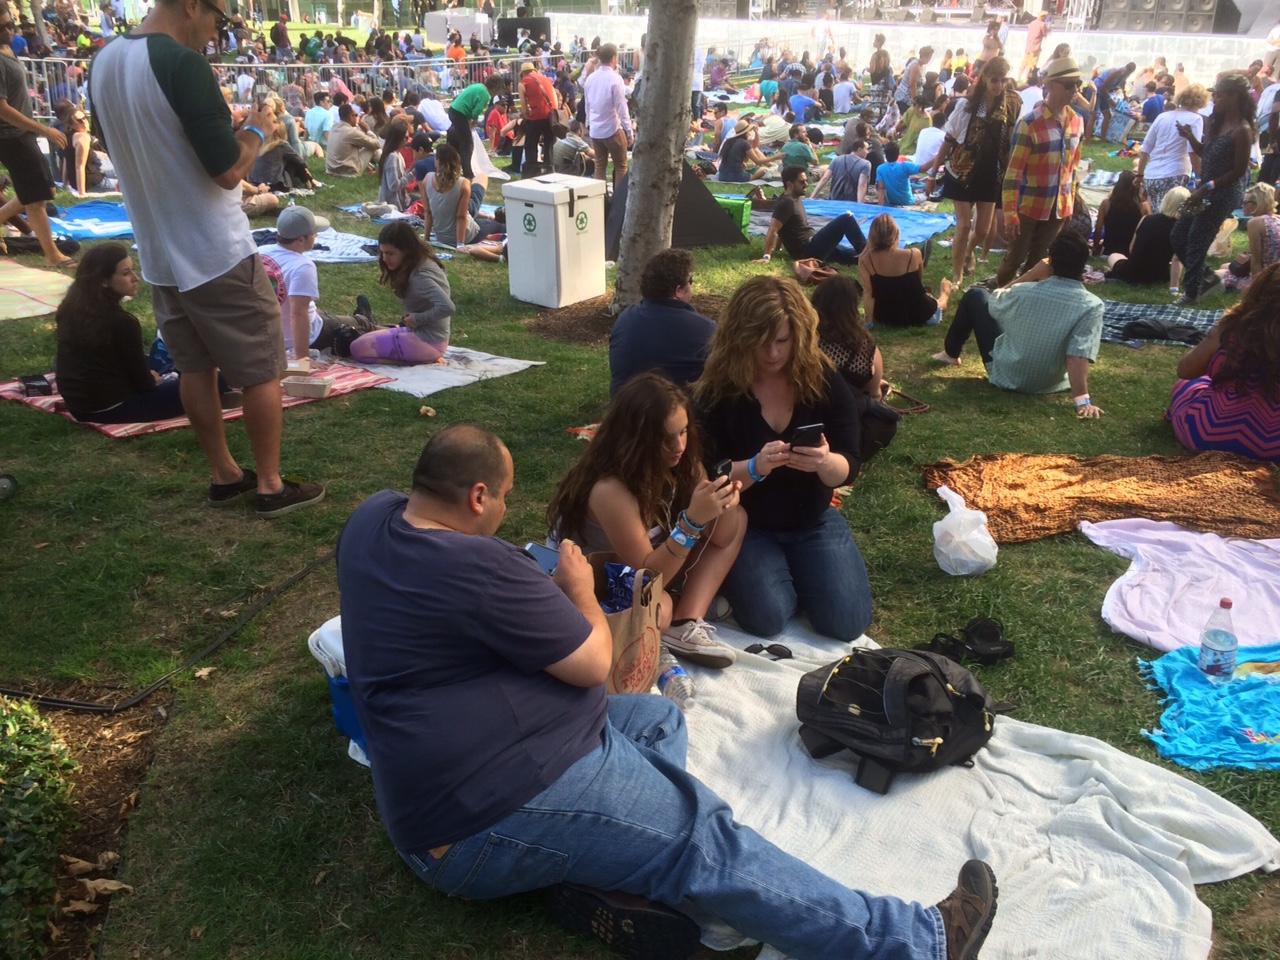 This is HipHop? The Lawn People at the De la Soul show.